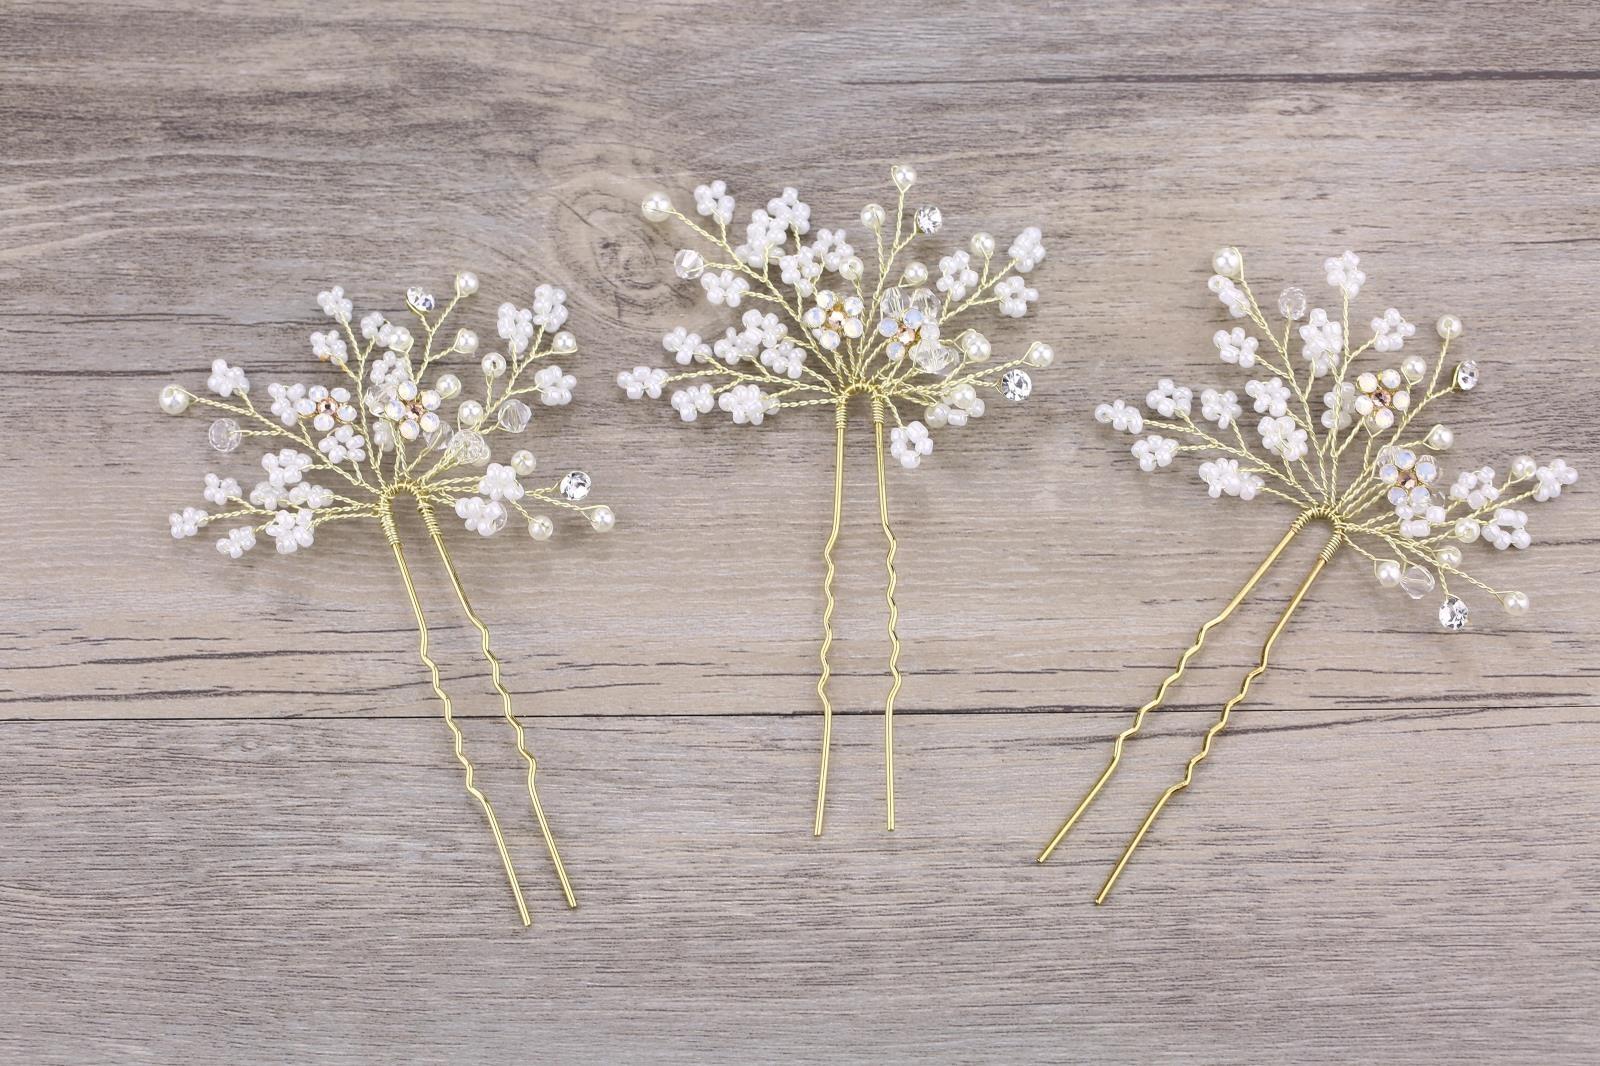 Twigs honey同款手工制作小米珠满天星发簪写真发饰婚礼头饰伴娘